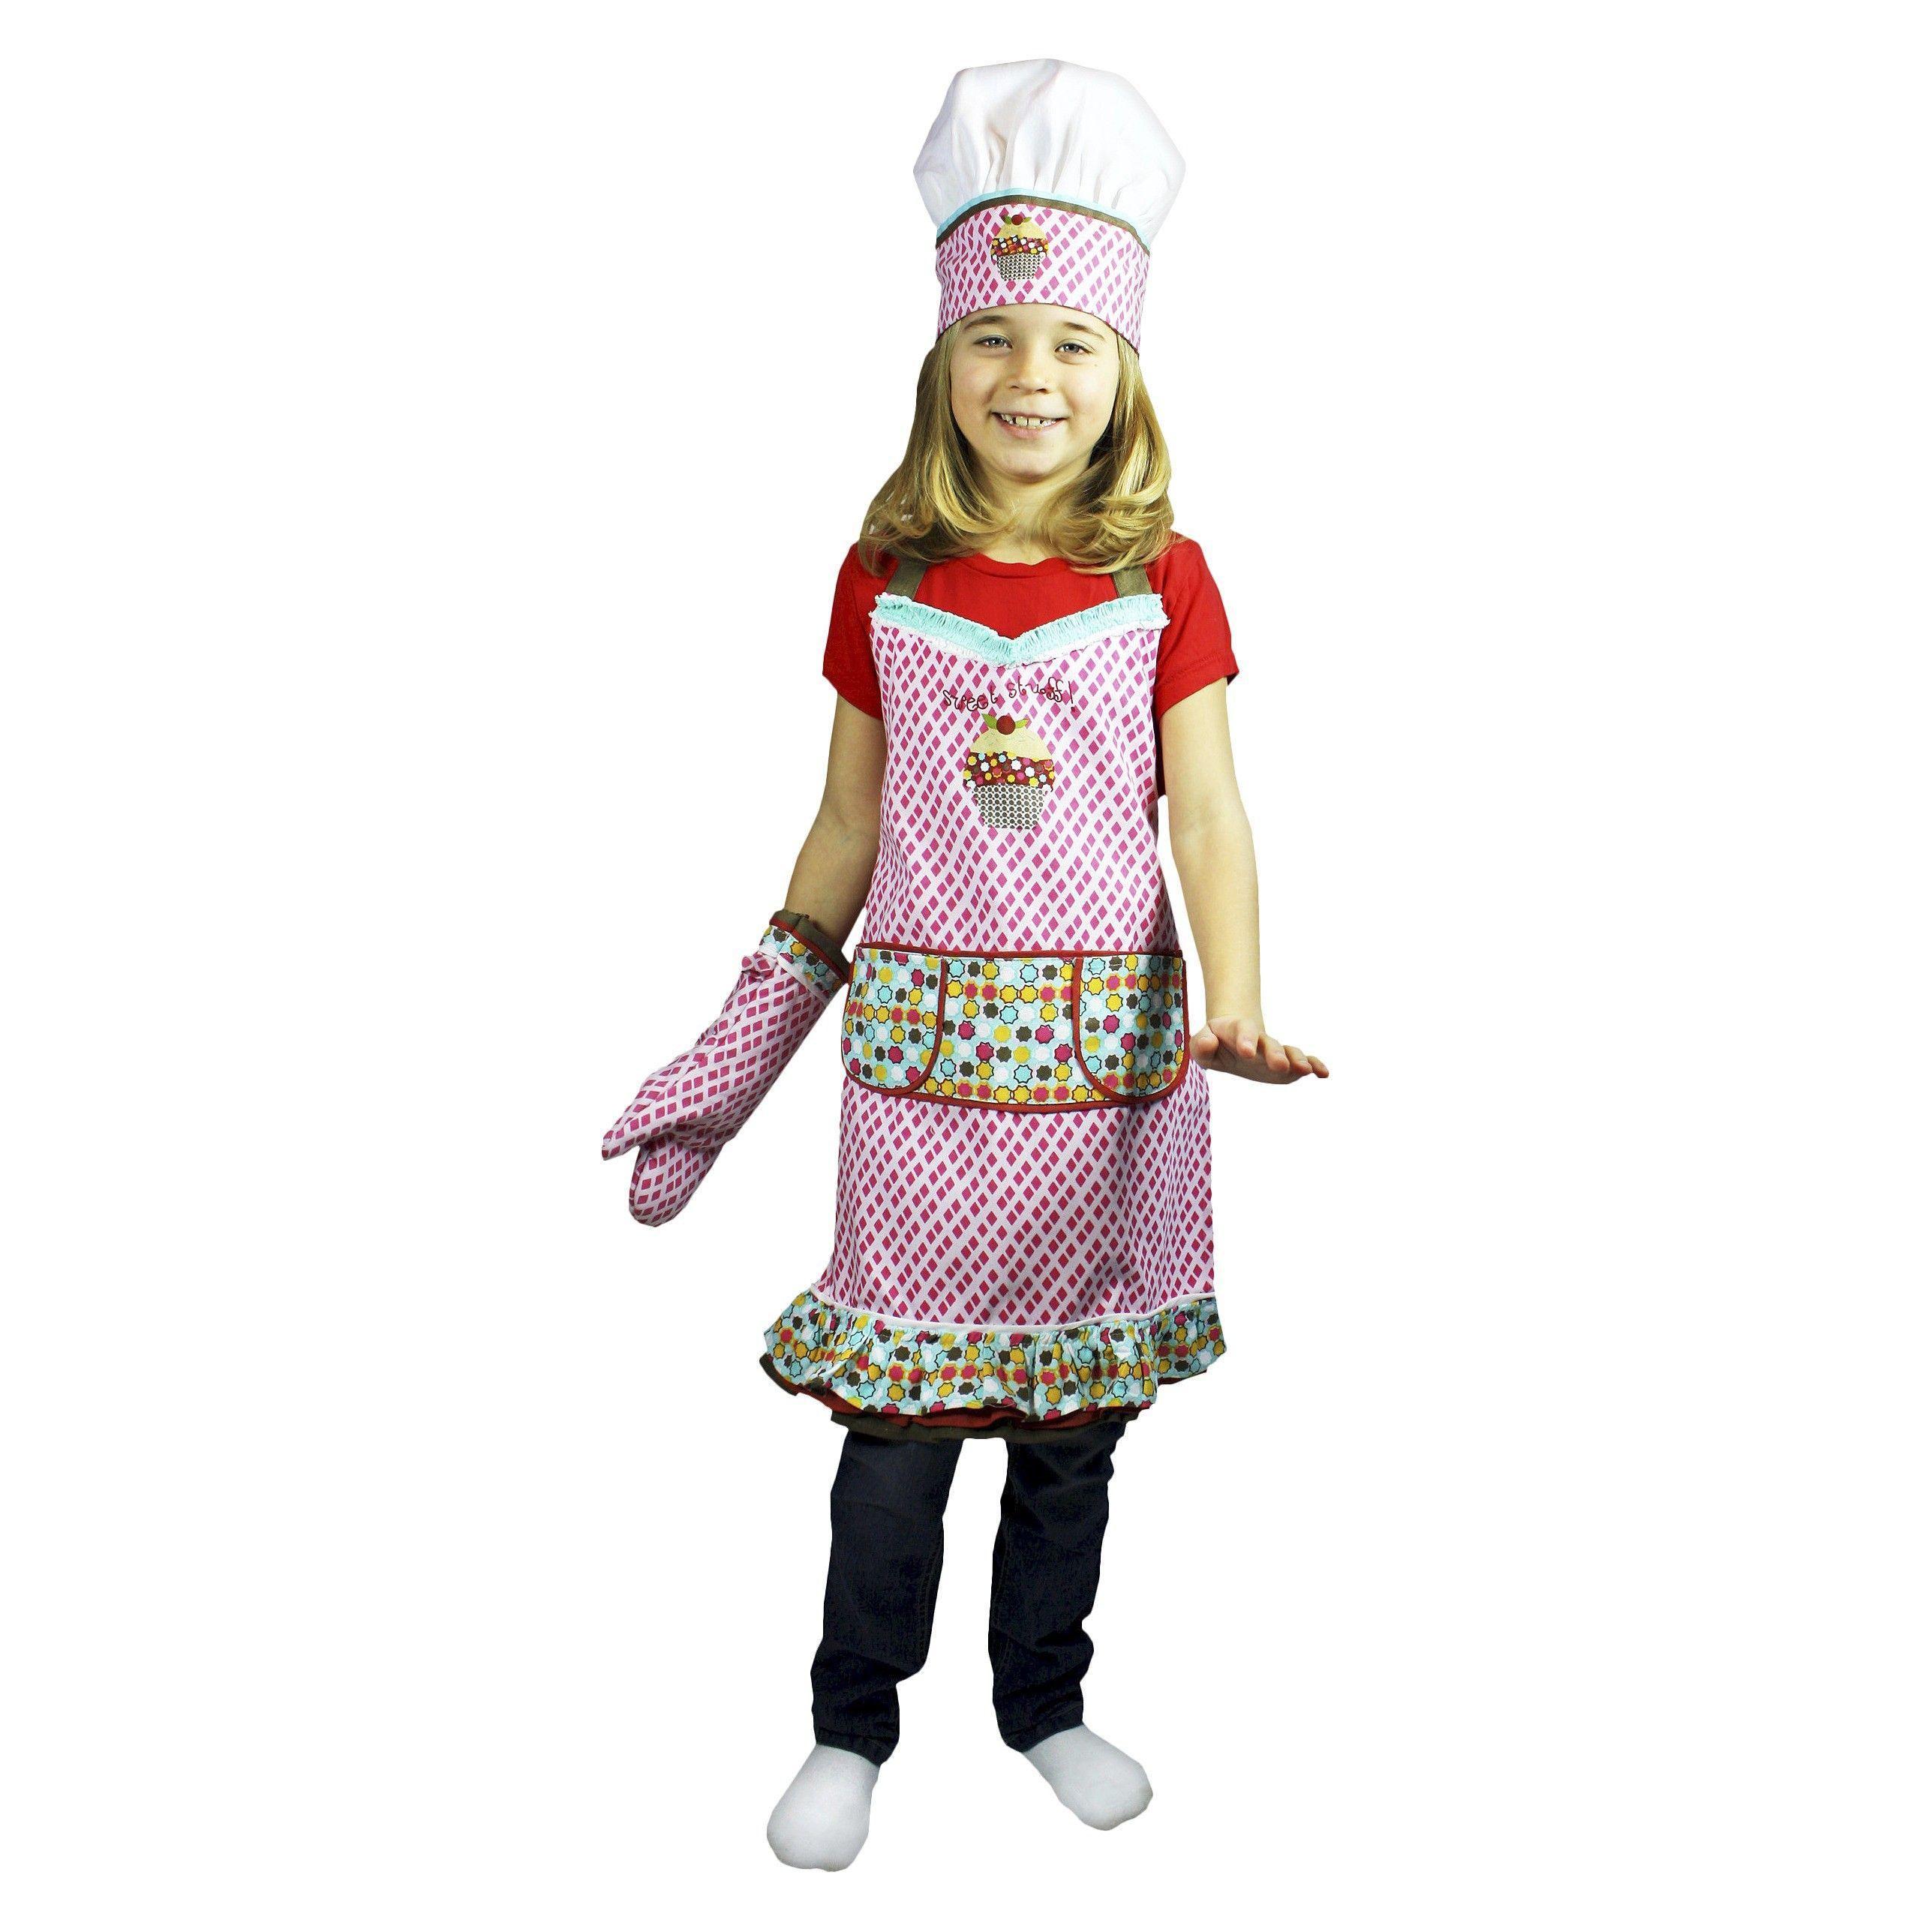 3 Piece Kids Chef Set (Apron, Hat, Mitt) - Sweet... : Target - maybe ...